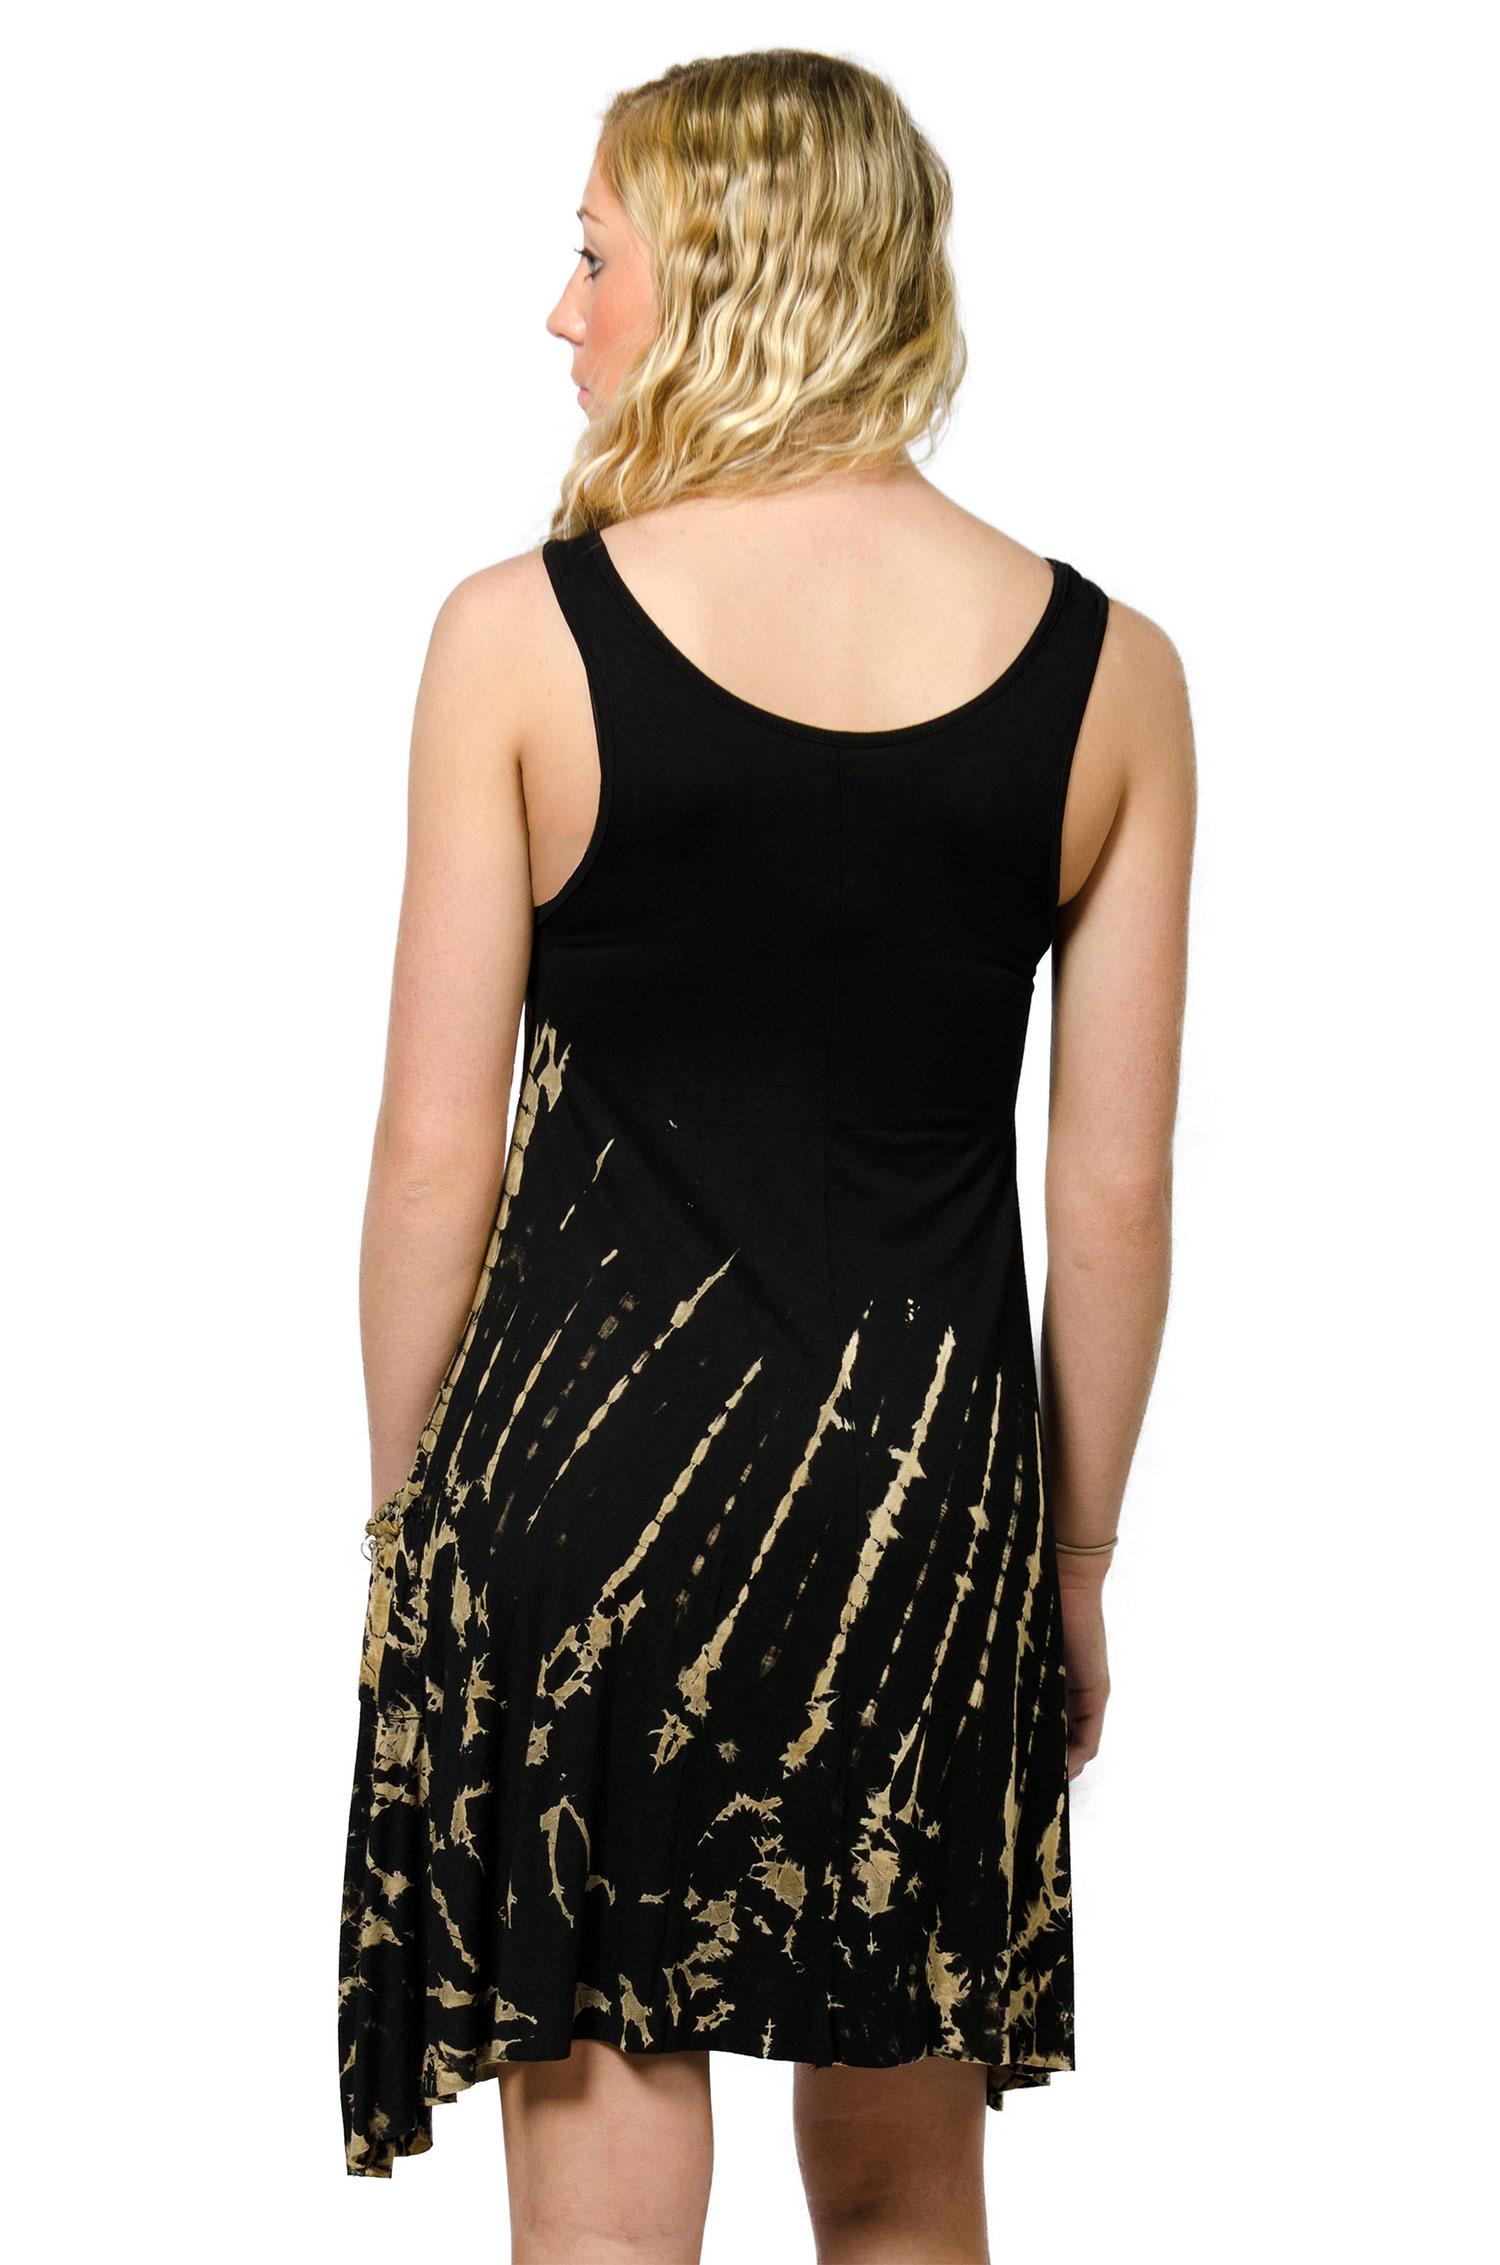 Pocket Sundress, Hand Painted Tie Dye, Black Tan Multi